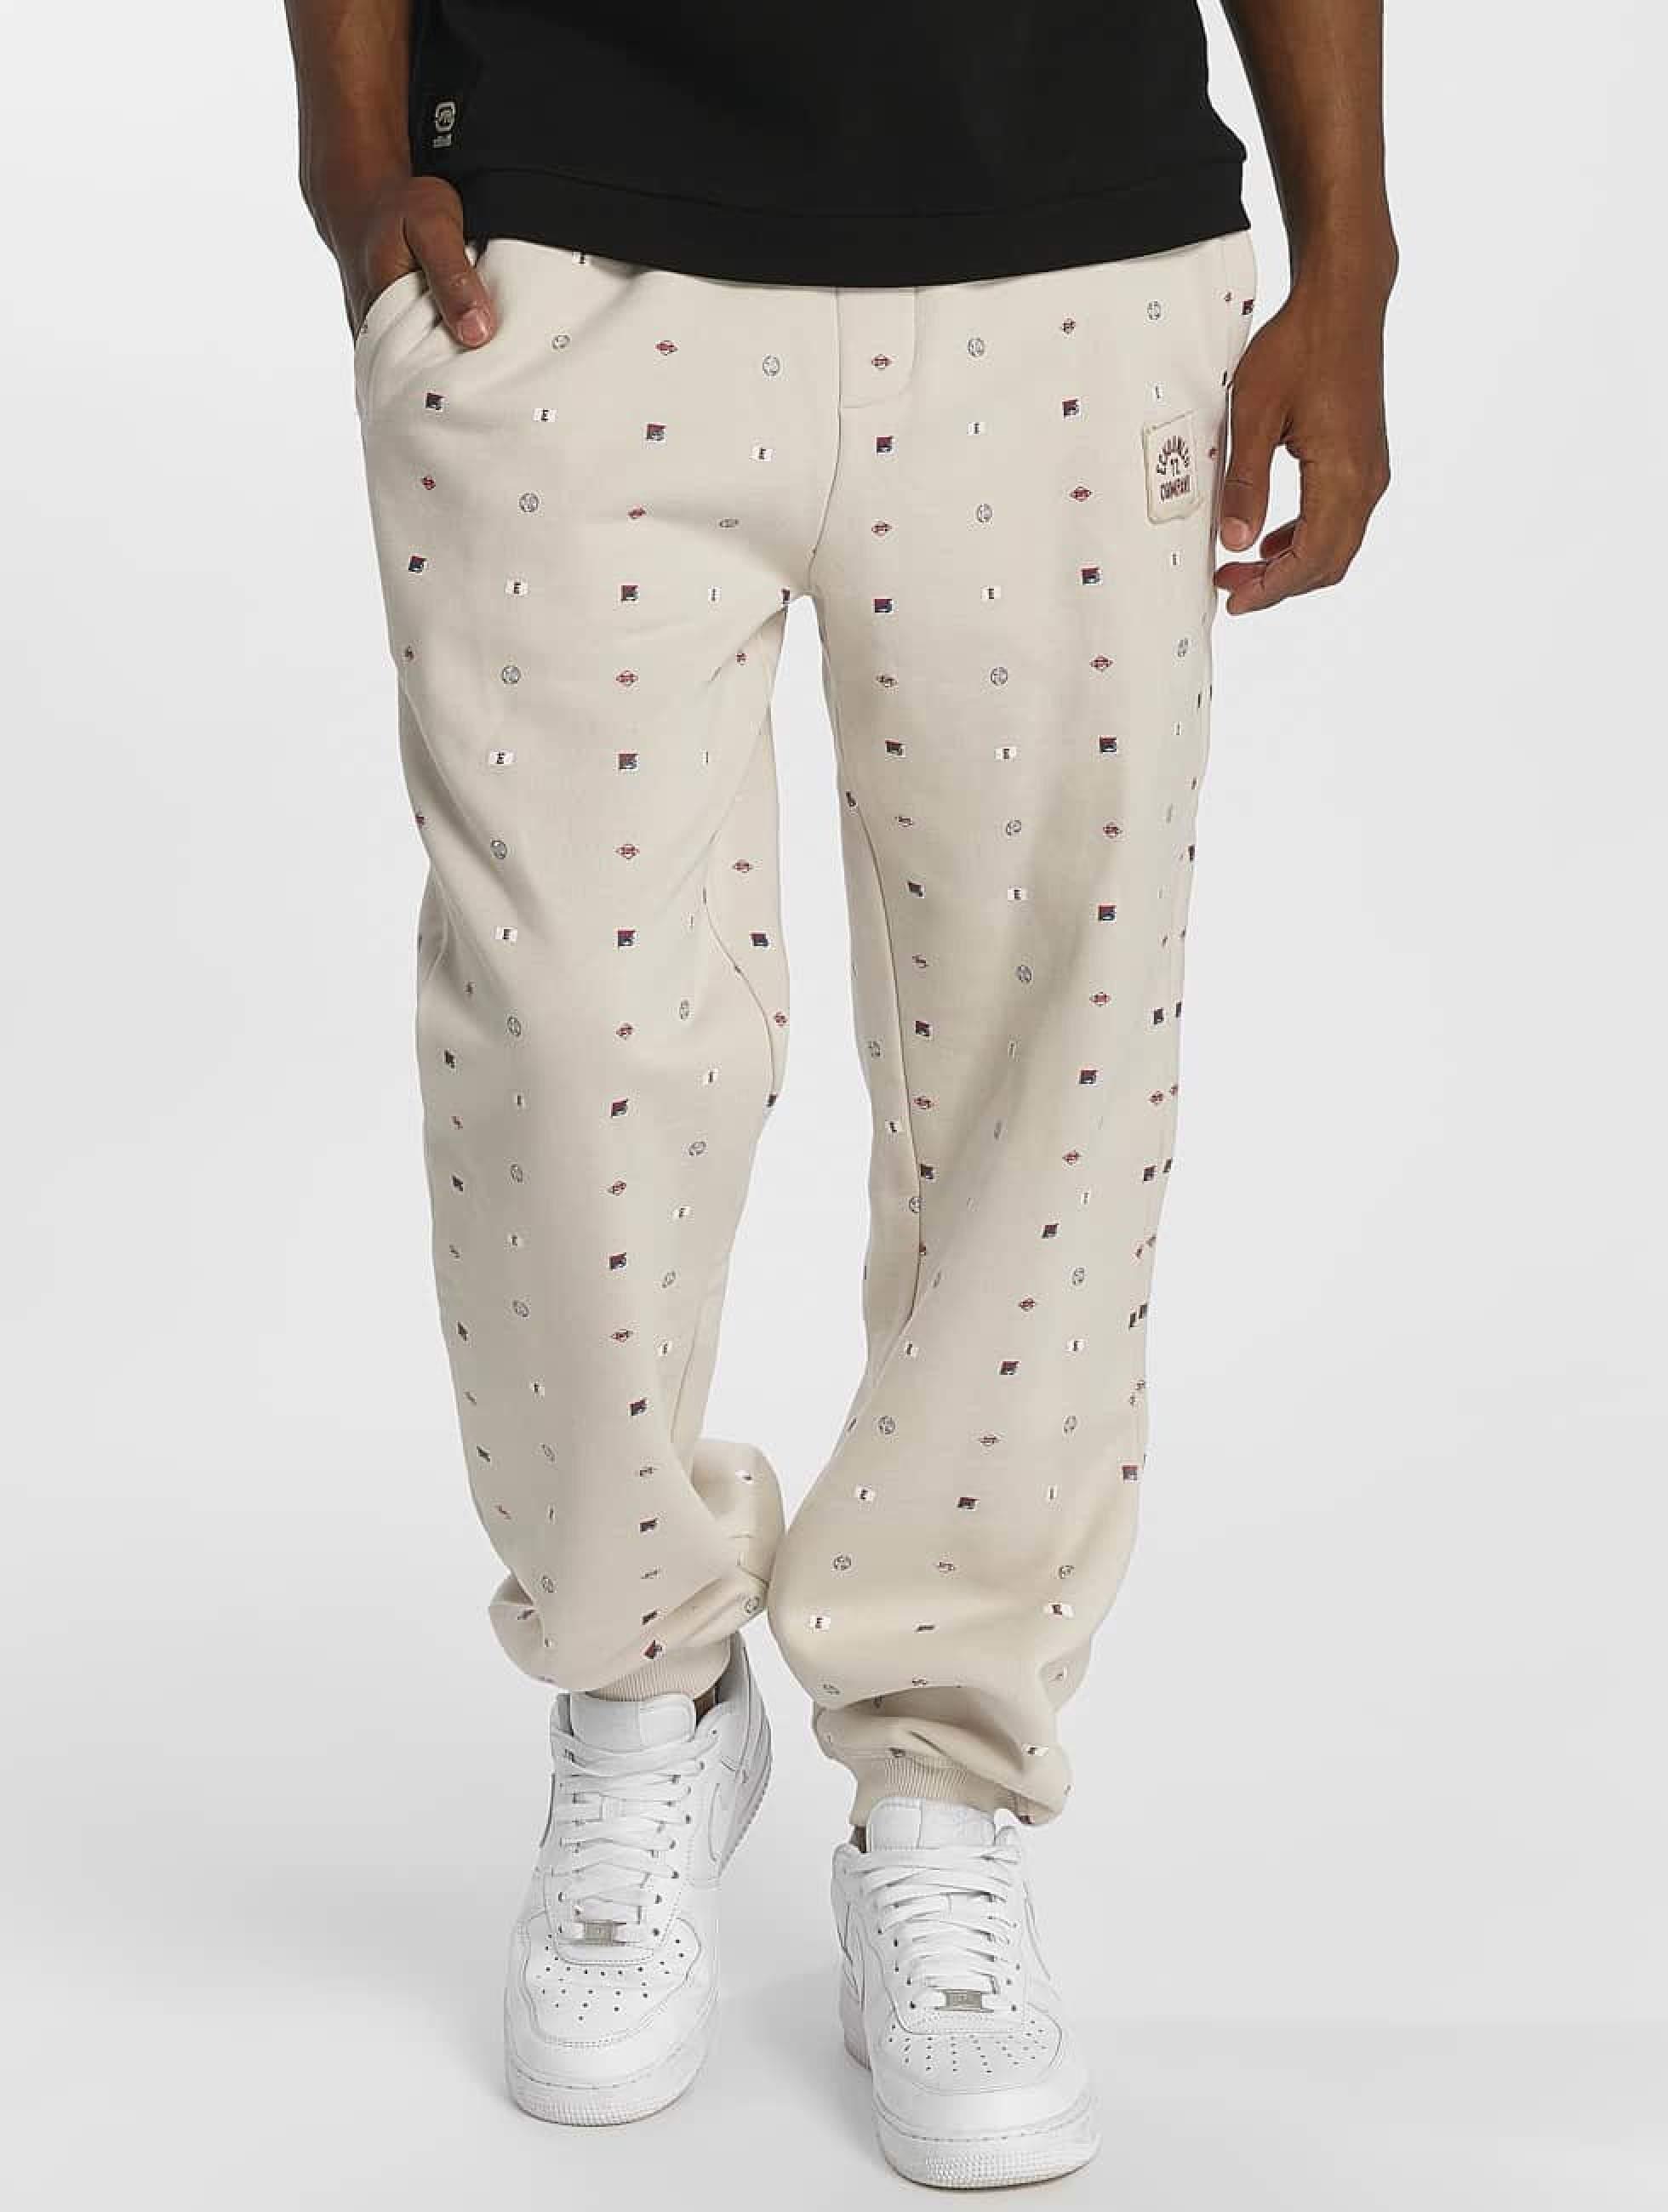 Ecko Unltd. / Sweat Pant CapeVidal in white L